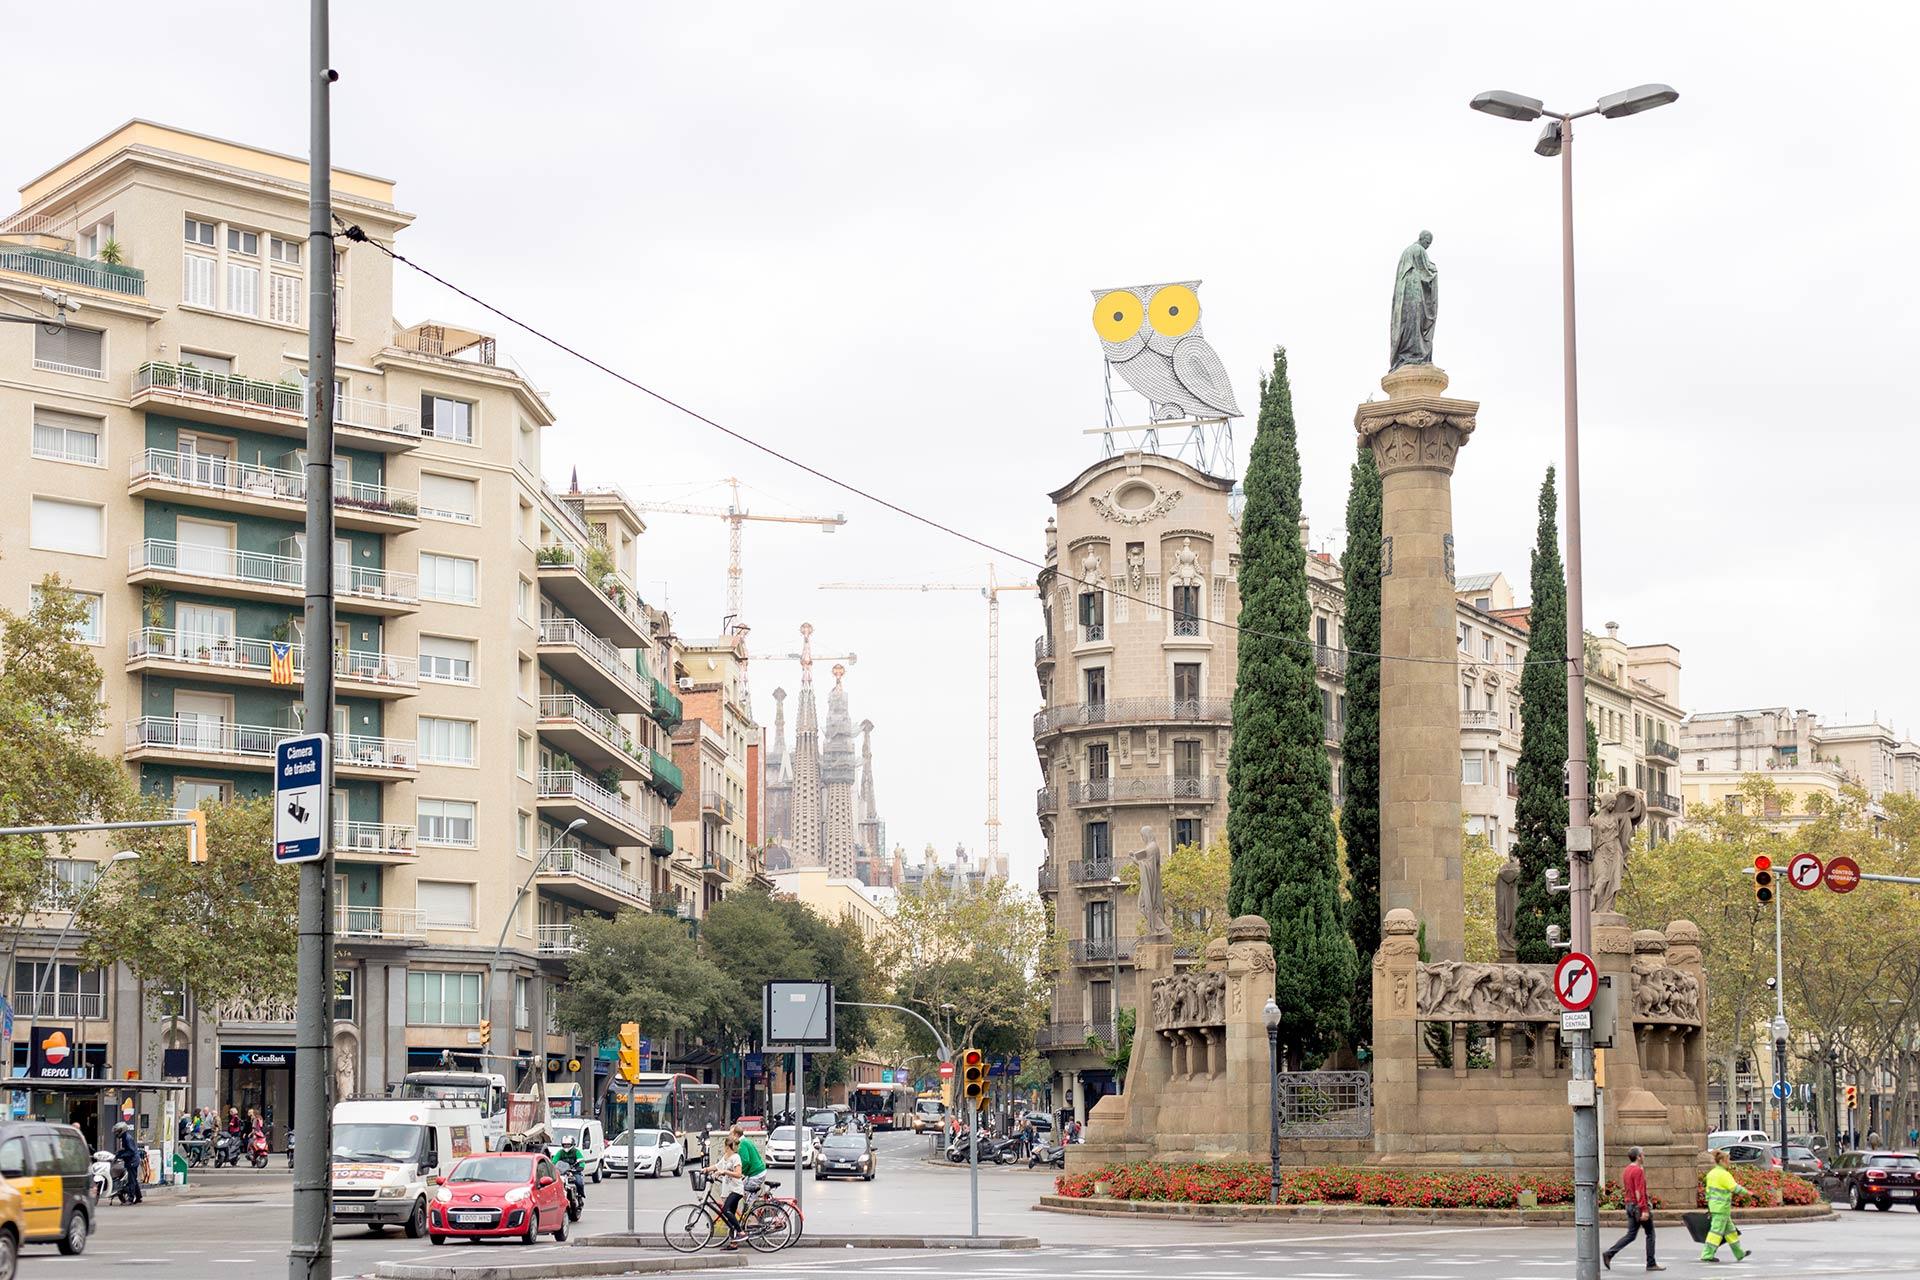 Barcelonan pöllö ja Sagrada Familia.